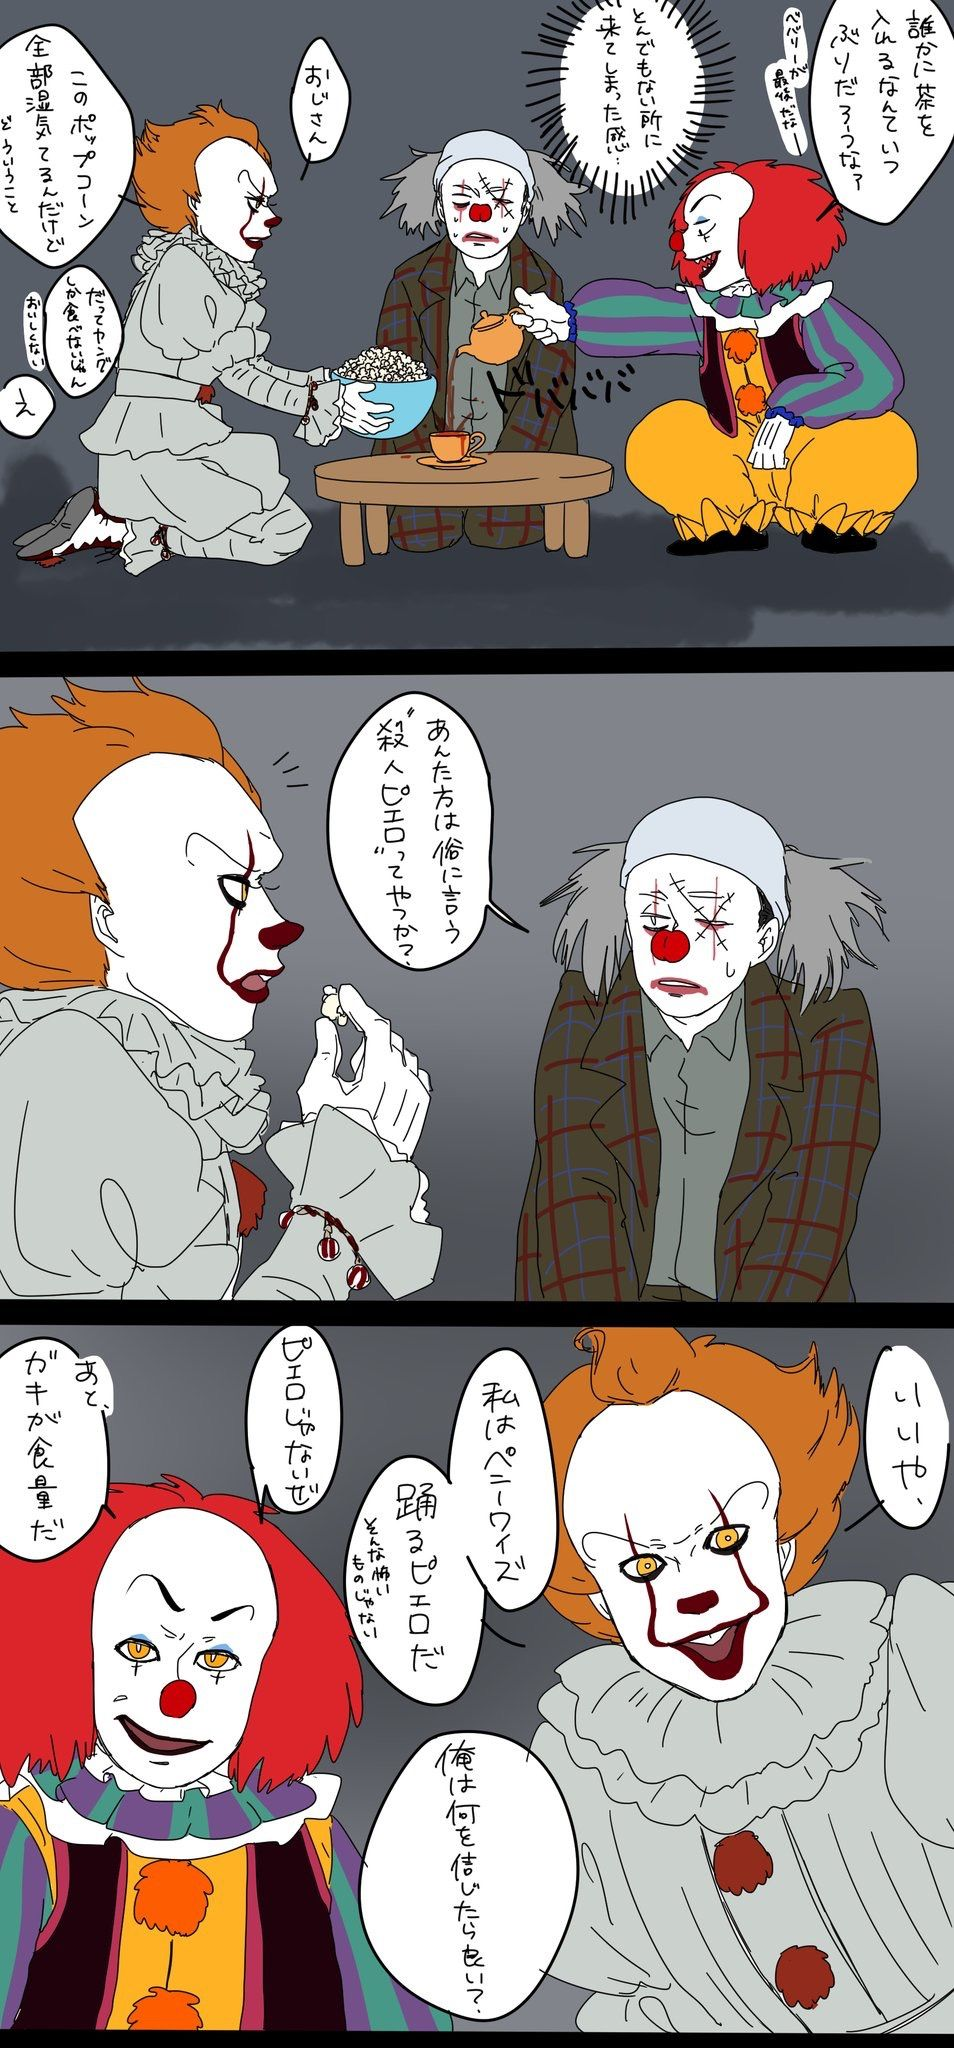 Pin by Bree on Horror Anime galaxy, Horror movie art